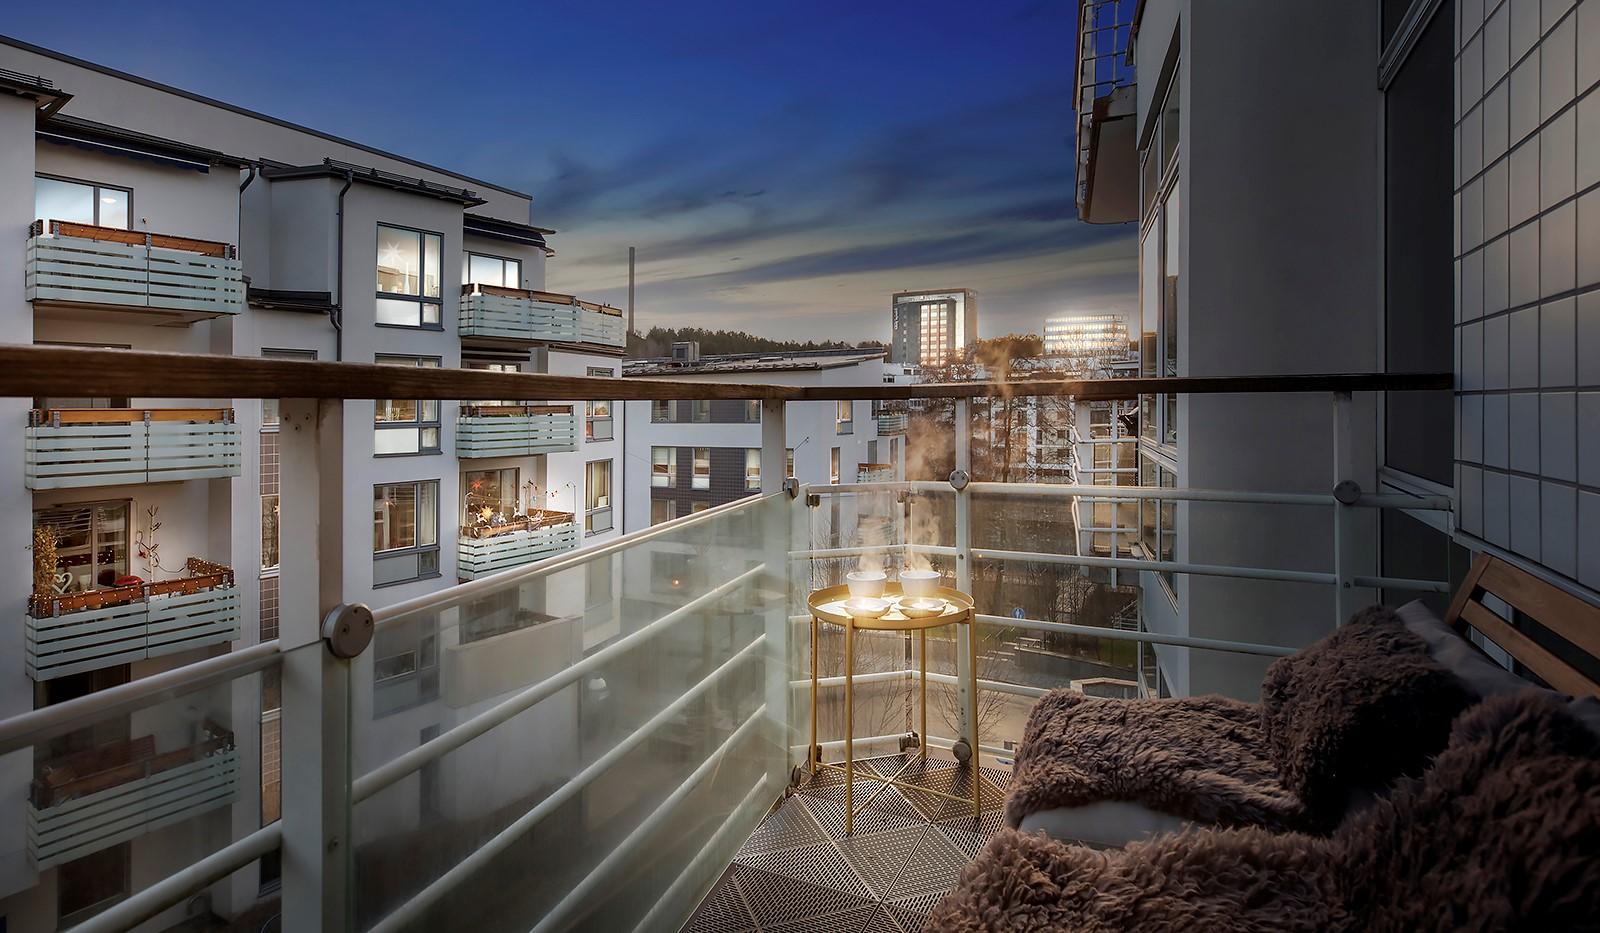 Sickla kanalgata 67, 3 tr - Stor möblerbar balkong